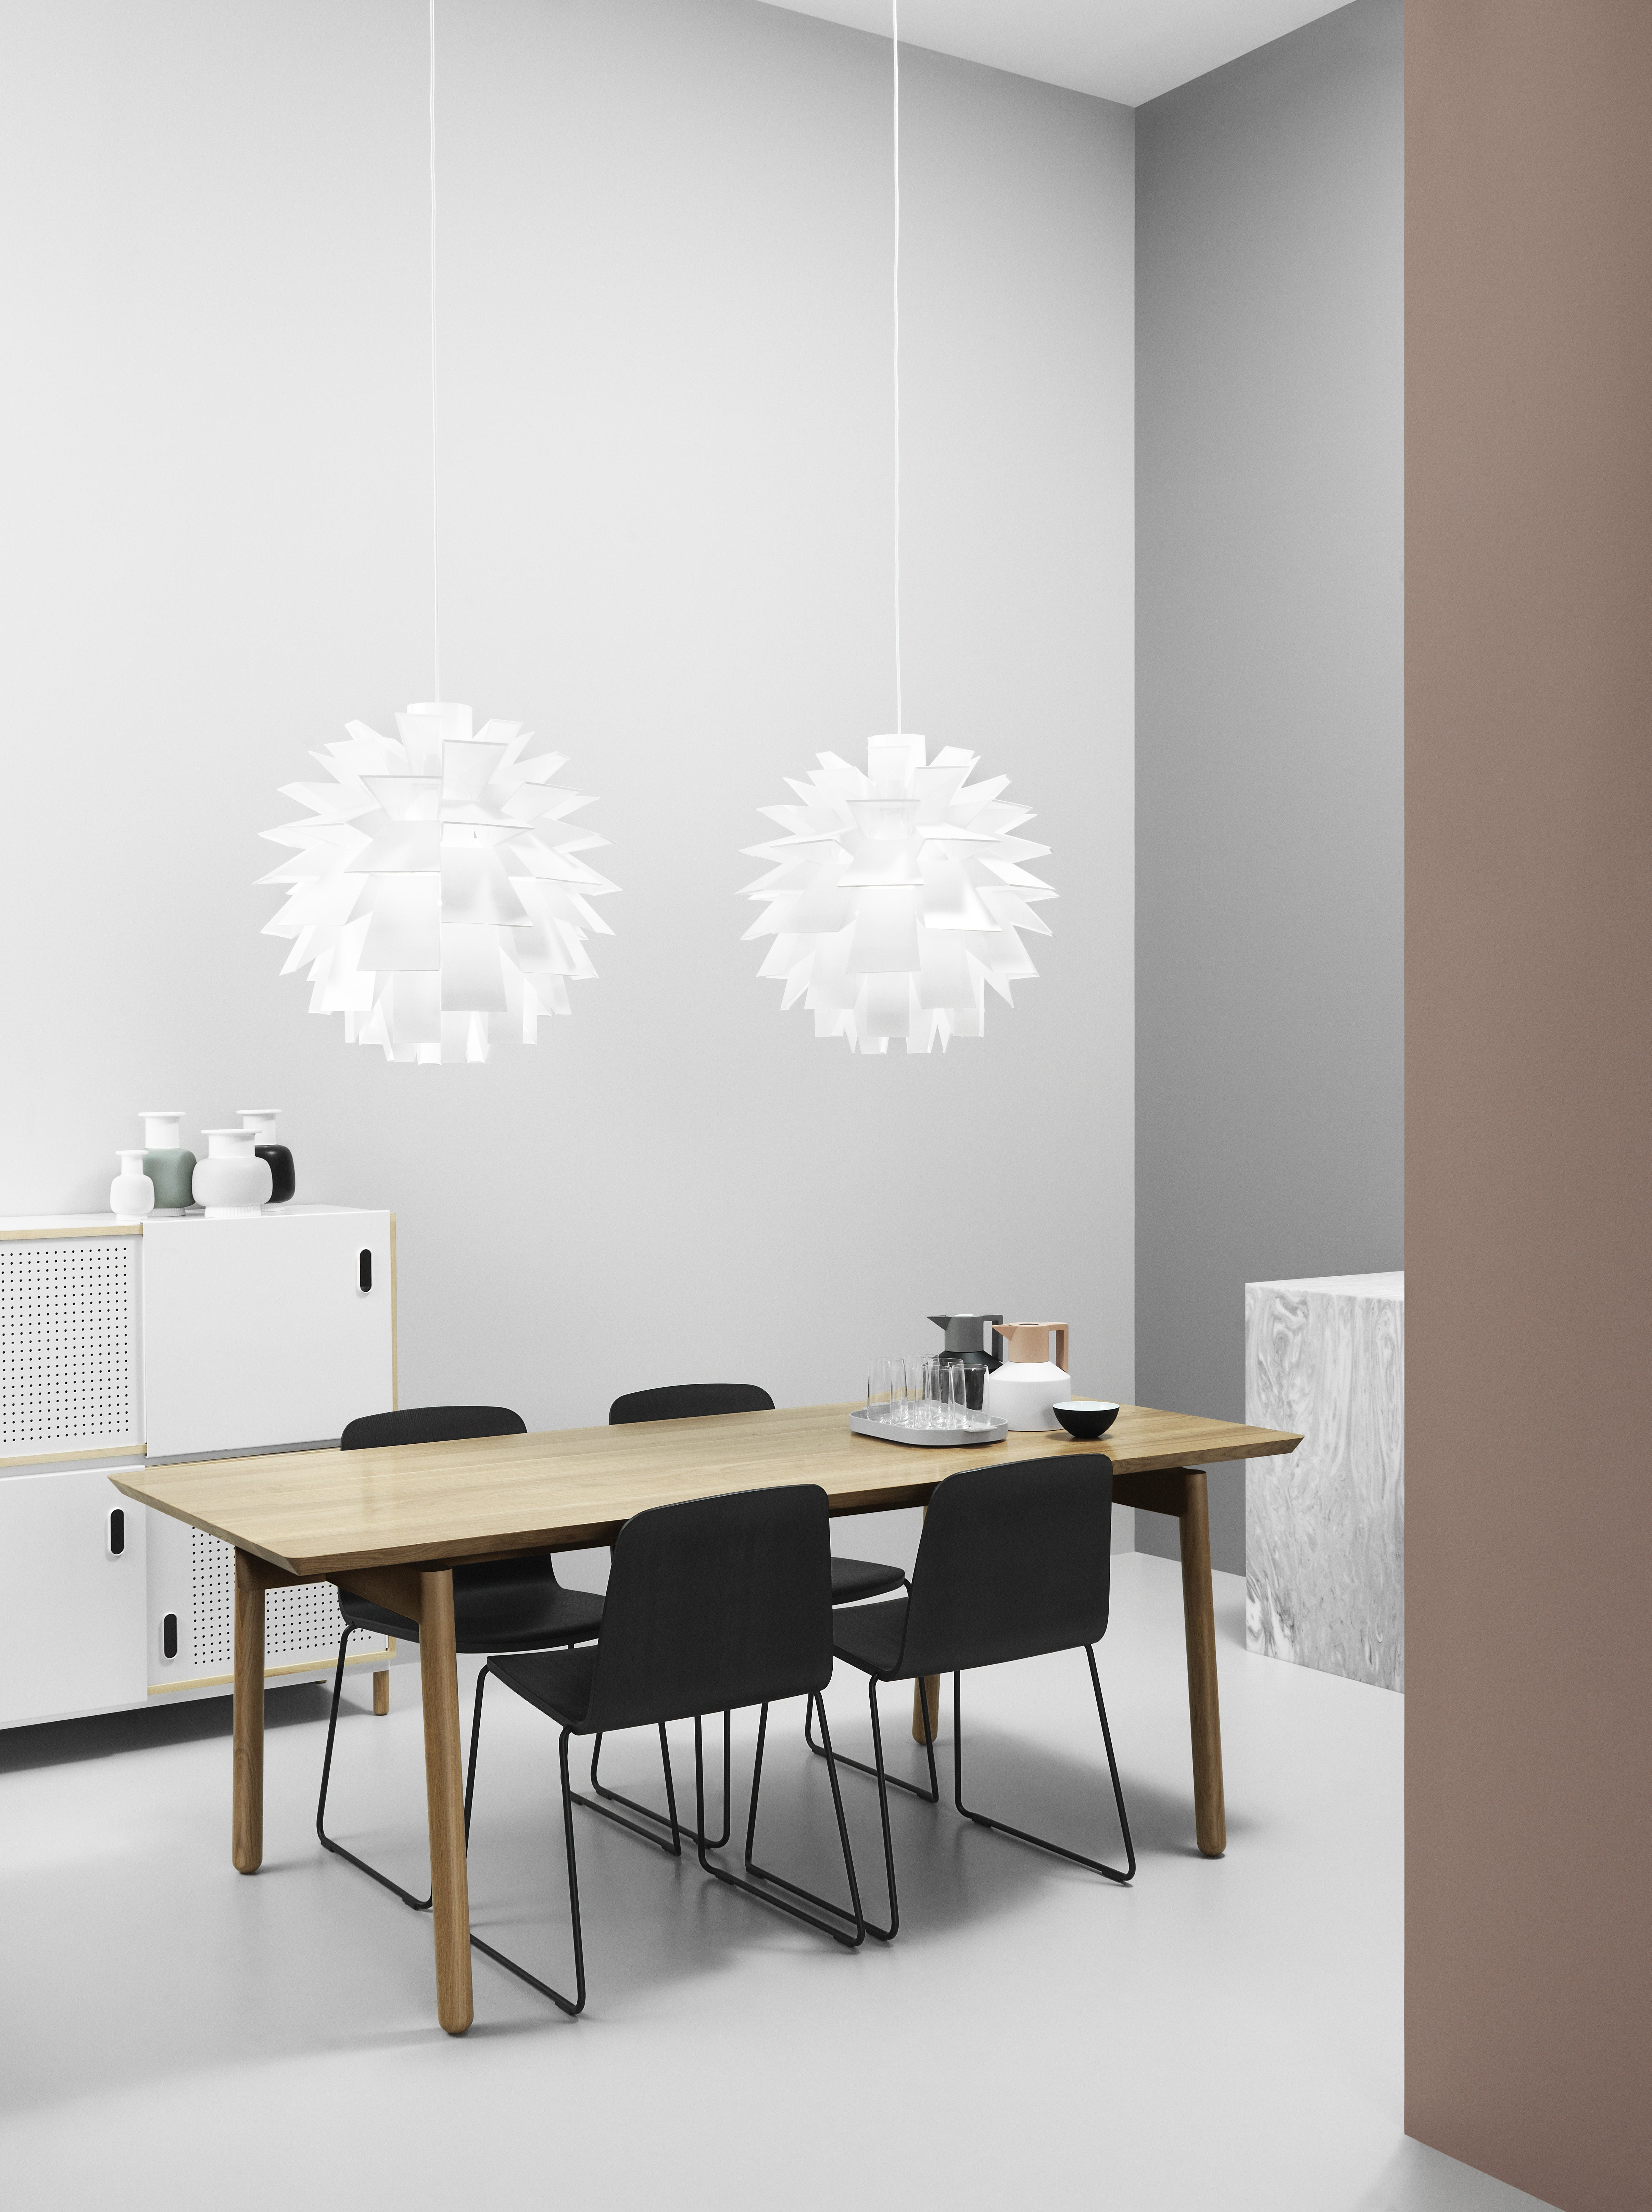 Nord Dining Table By Normann Copenhagen Buy It In Domesticoshop Com Minimalist Dining Room Scandinavian Furniture Design Interior Furniture